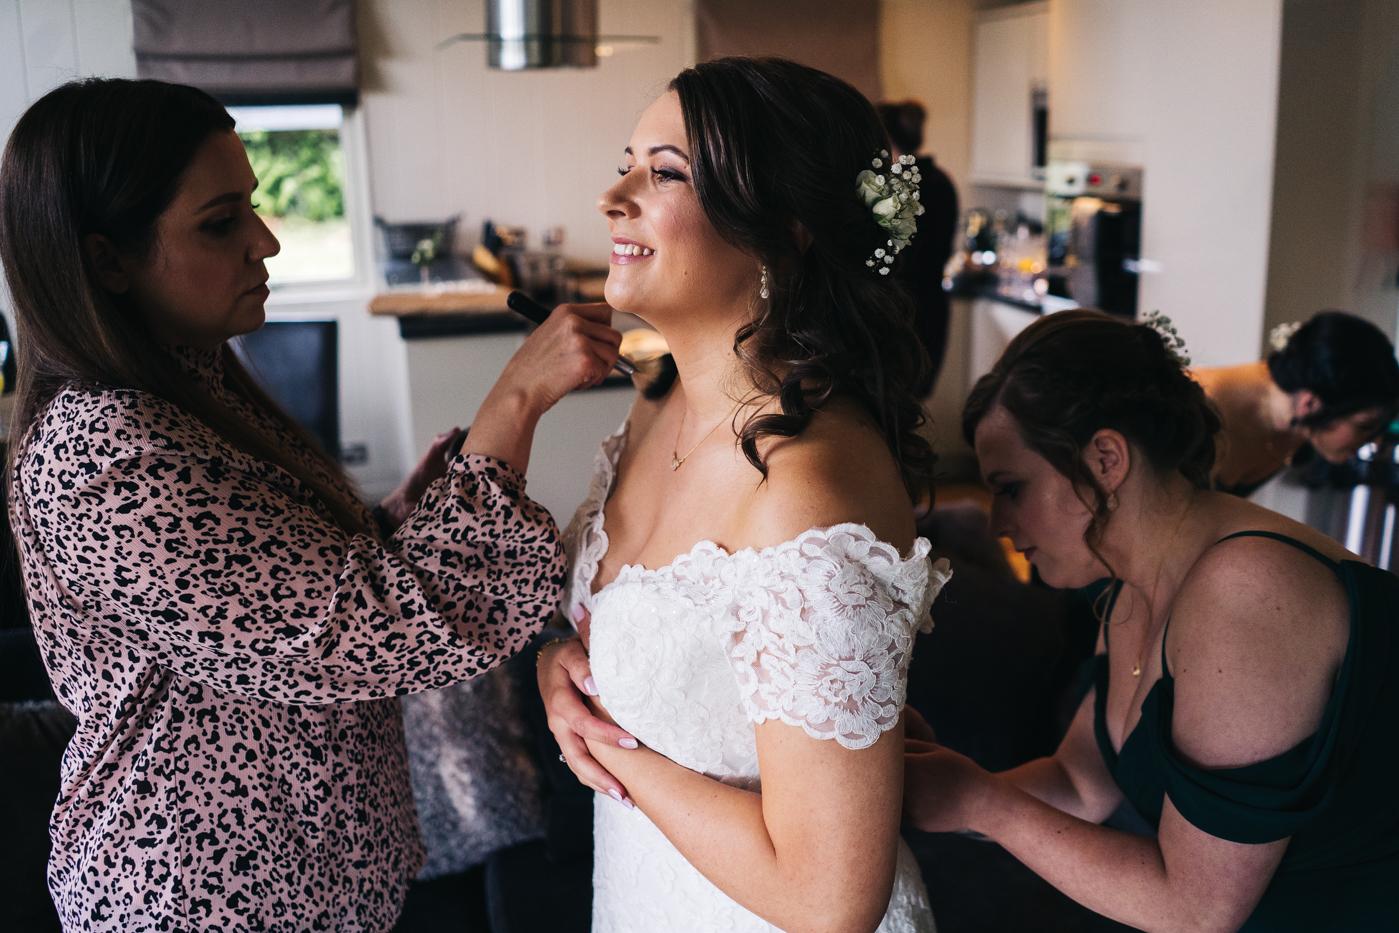 scottish-wedding-trossachs-loch-tay-highlannds-relaxed-photography-photographer-0008.jpg